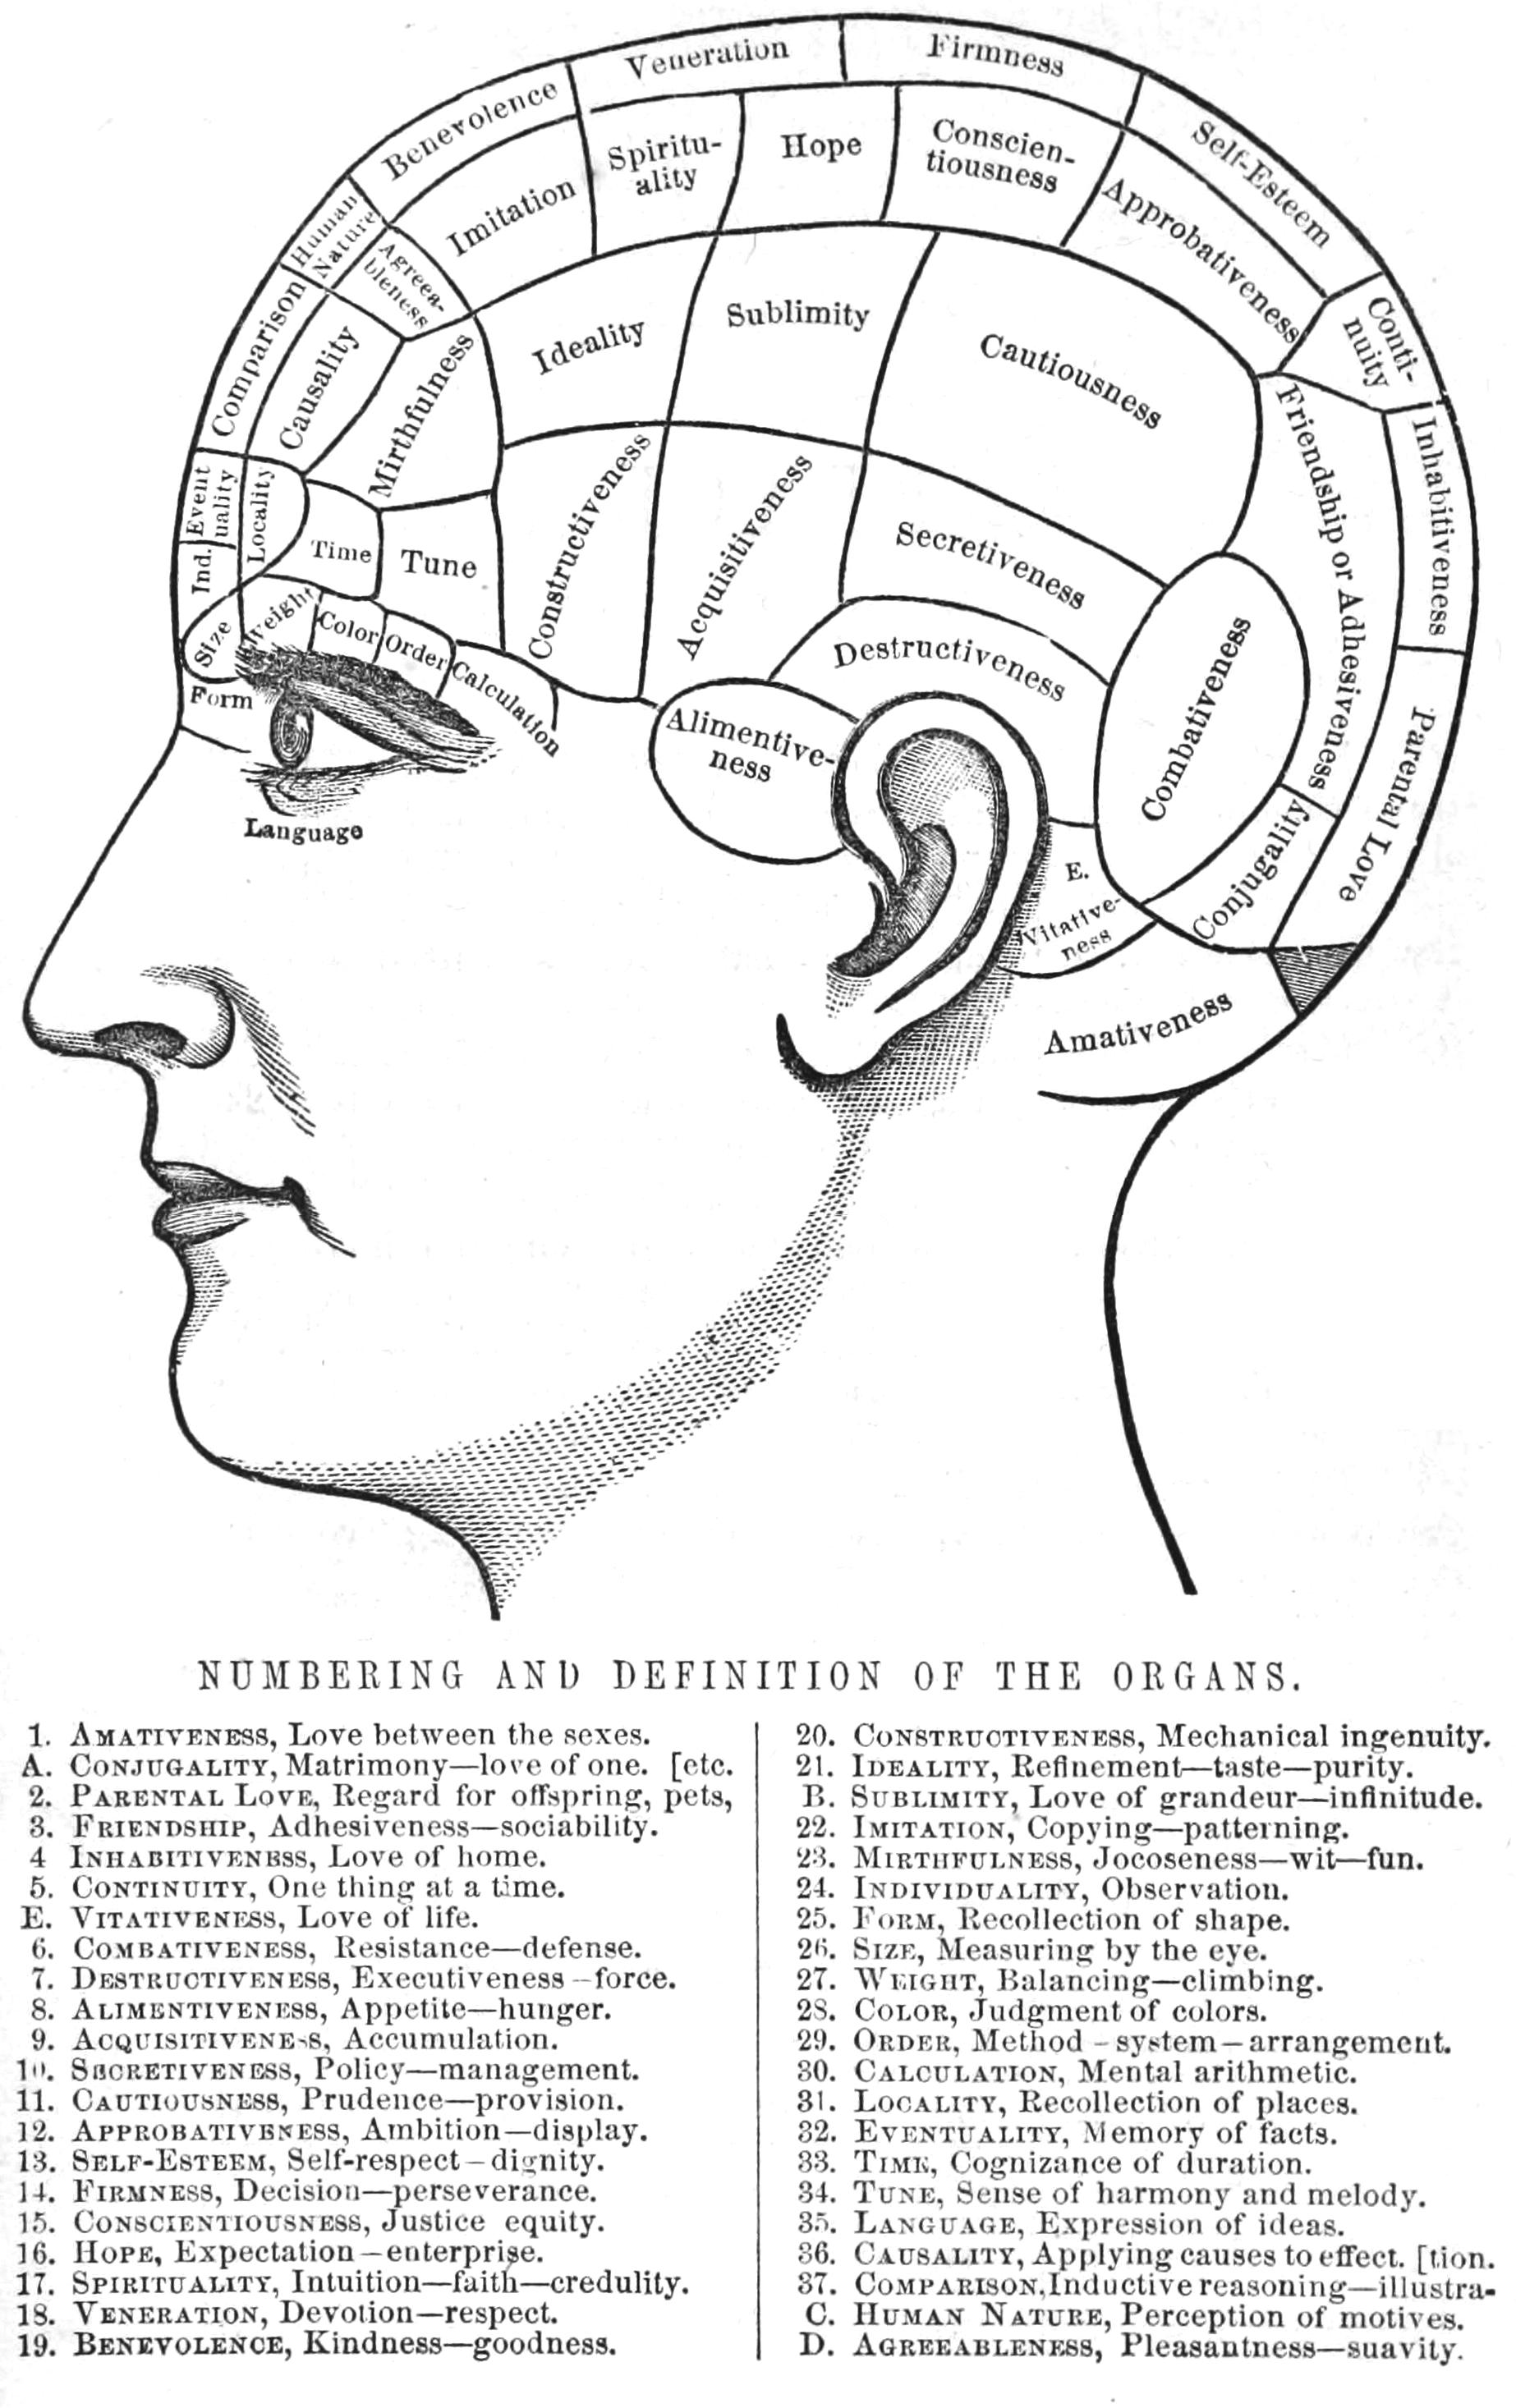 Phrenology Chart Poster Phrenology chart poster | Diagrams & Maps ...